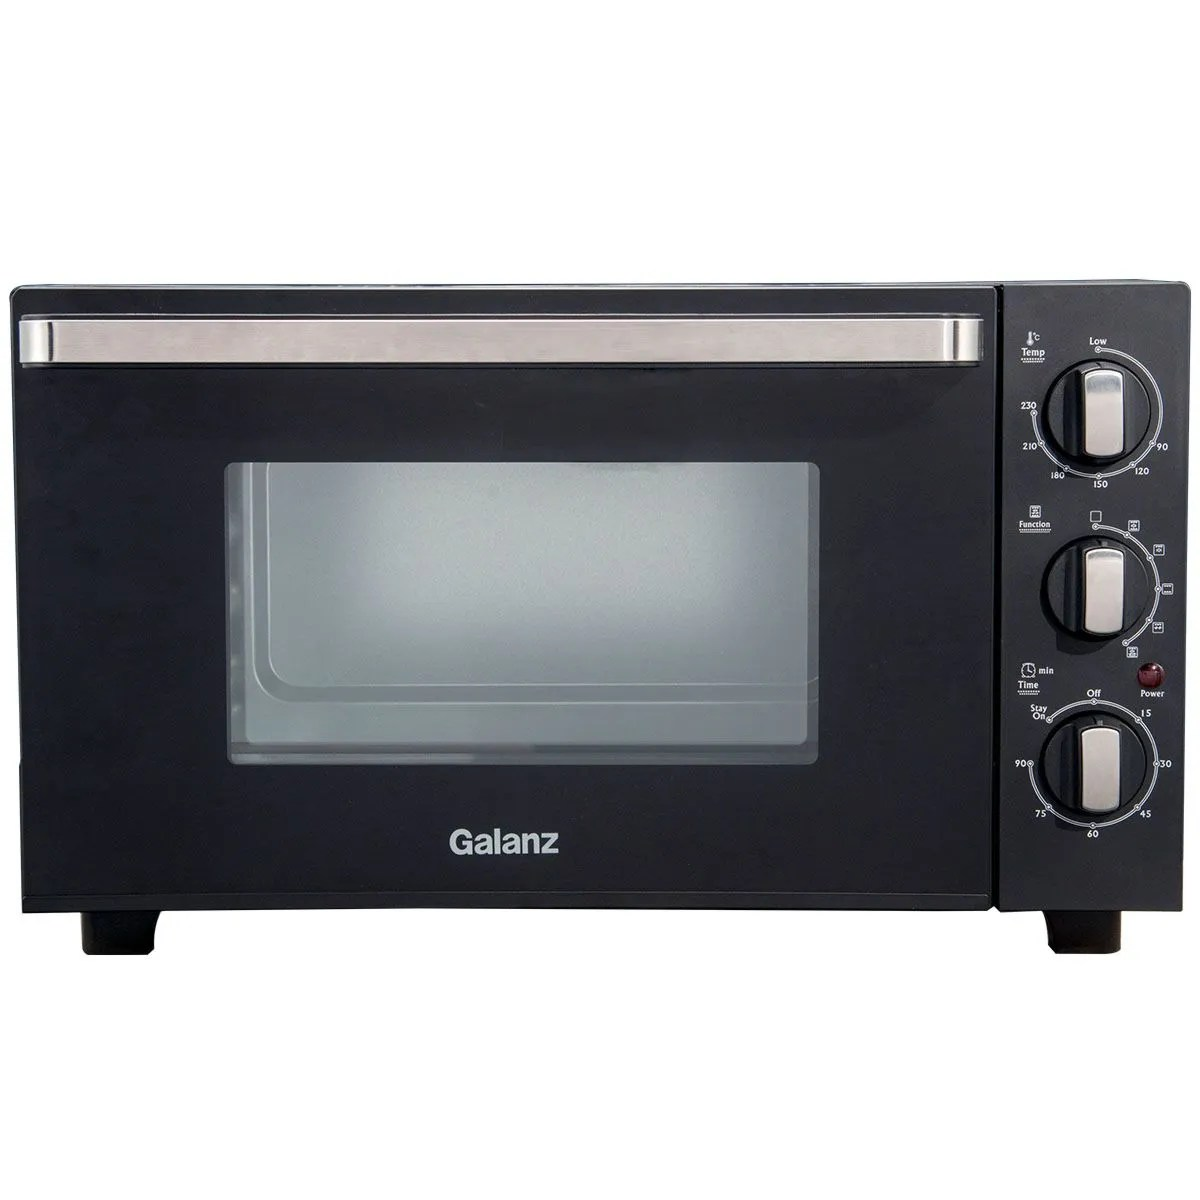 galanz mouk001b 30l 1500w mini convection oven black